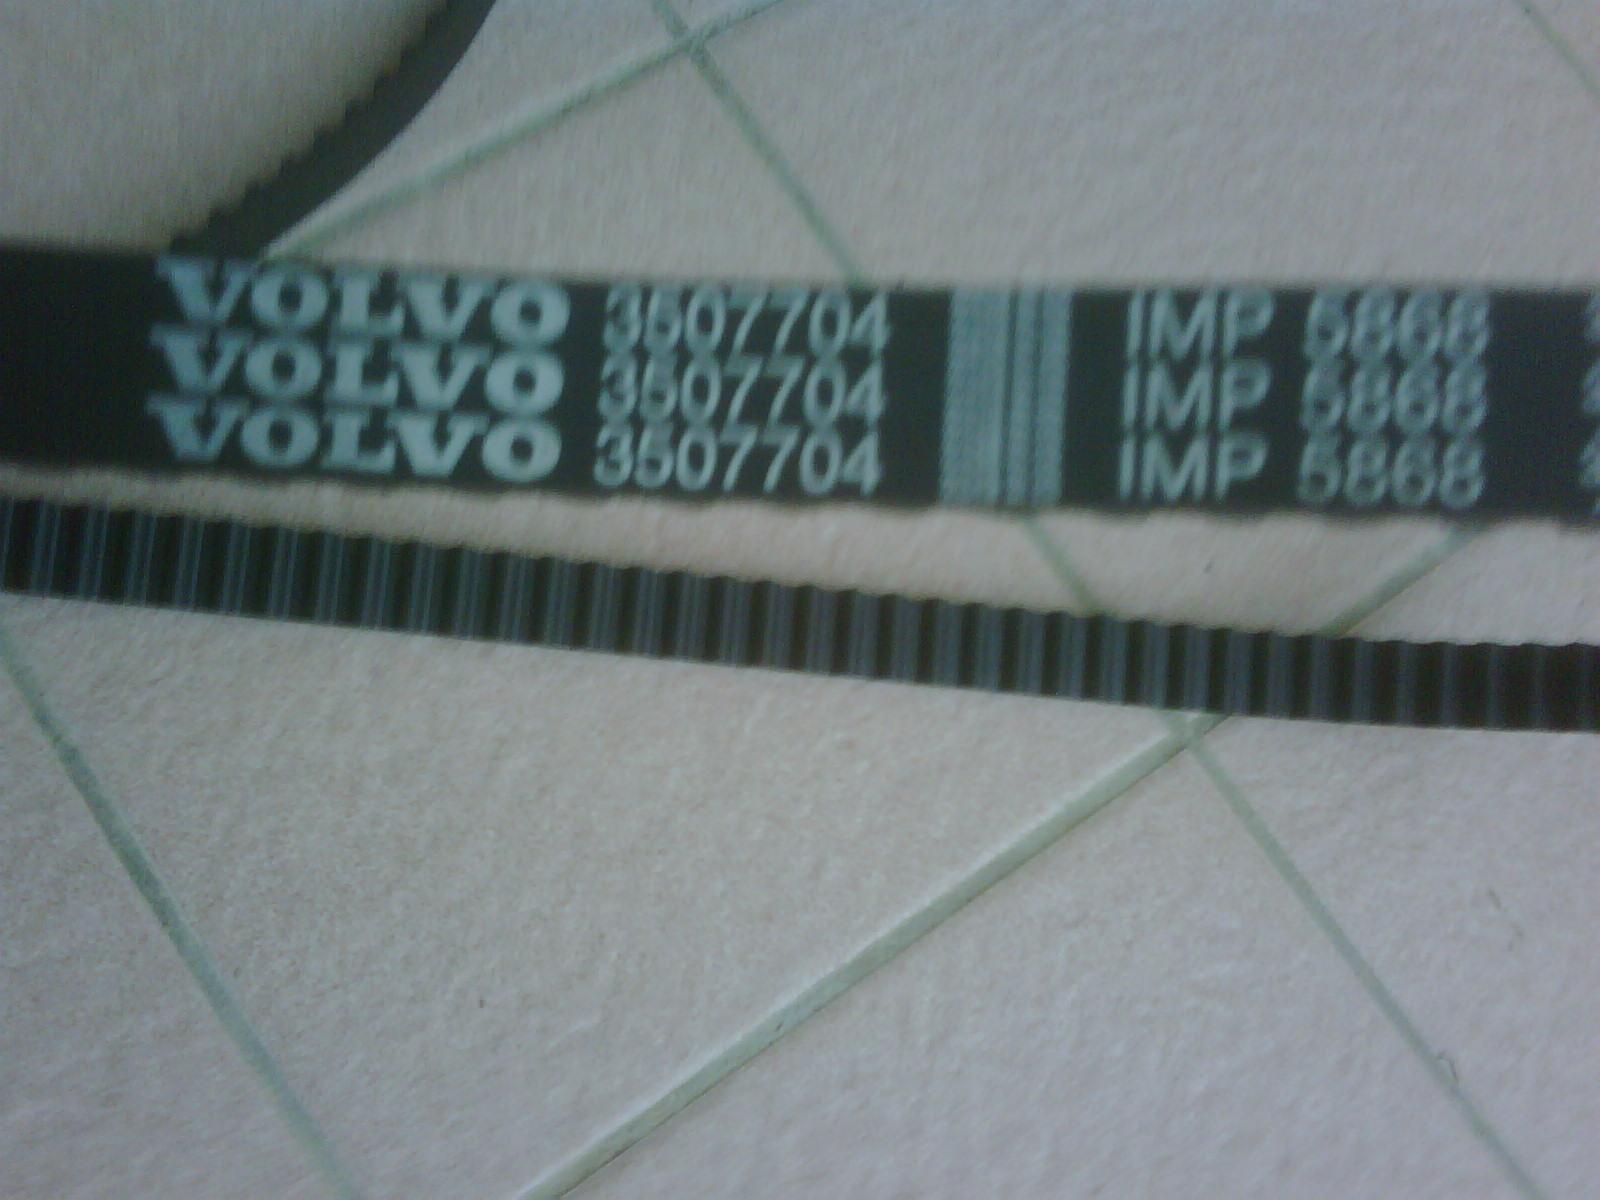 VOLVO 940 LIVE !!: Timing Belt